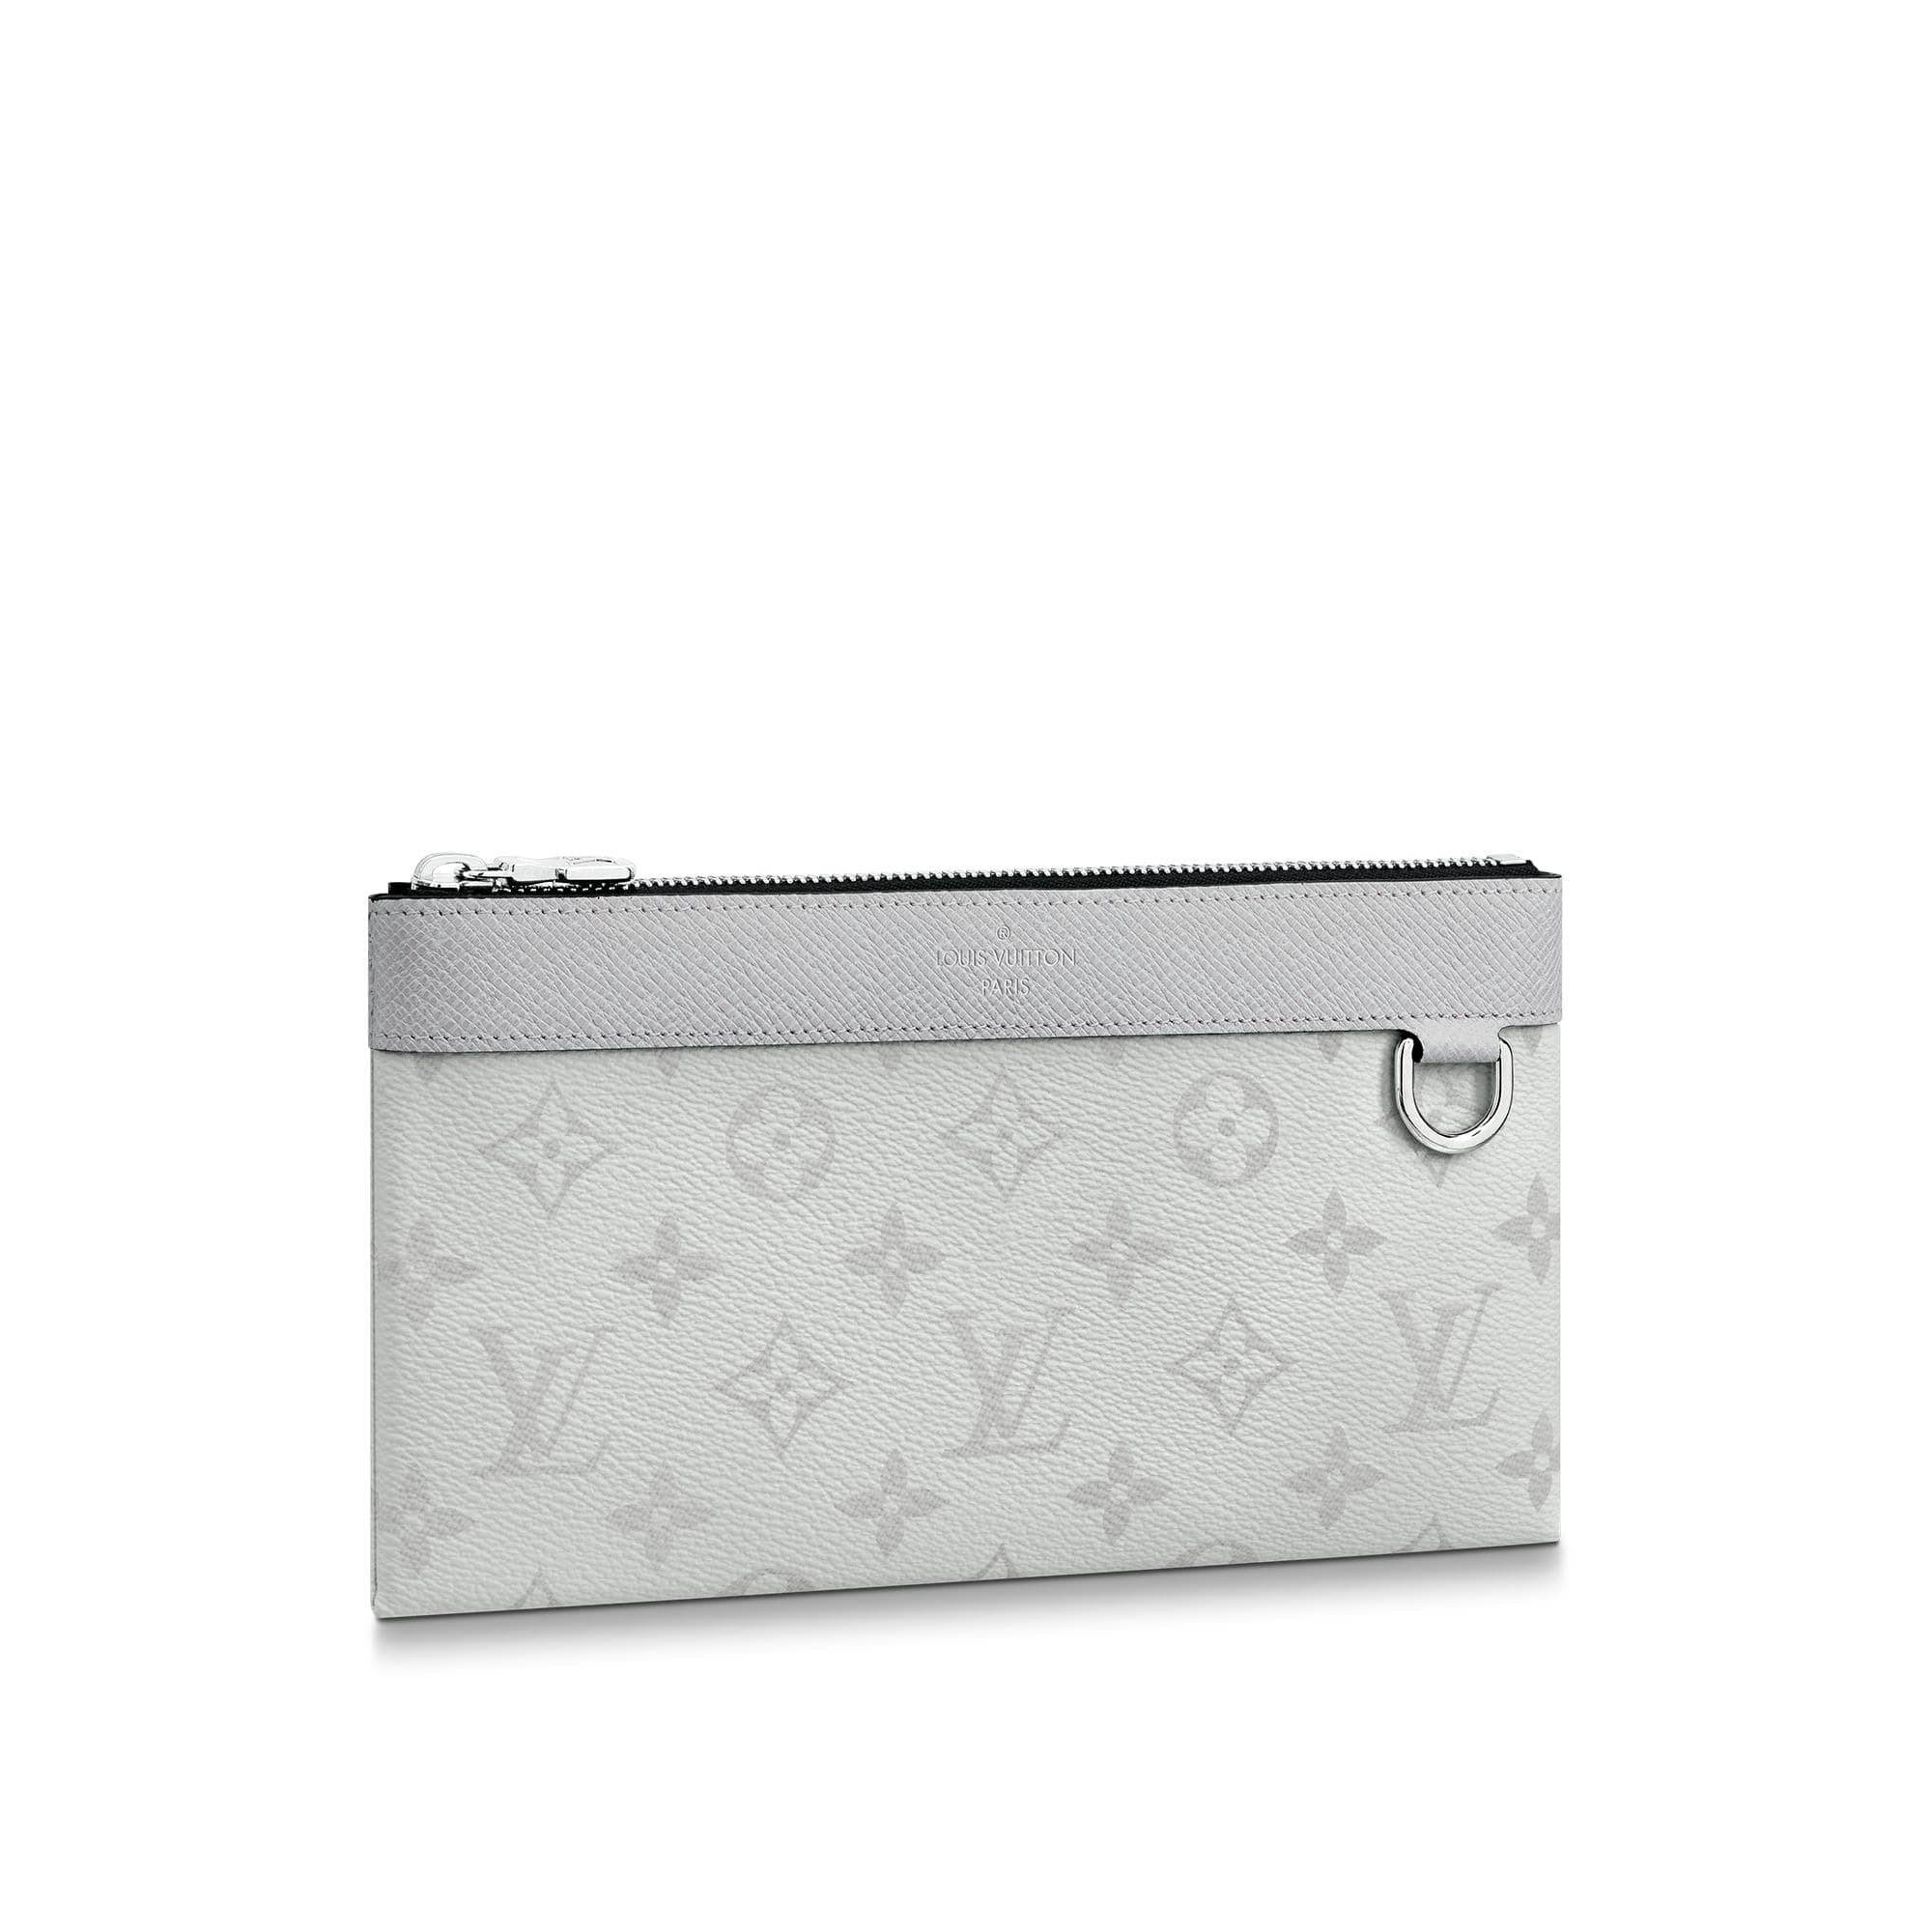 Louis Vuitton Discovery Pochette Monogram Antarctica Taiga PM White